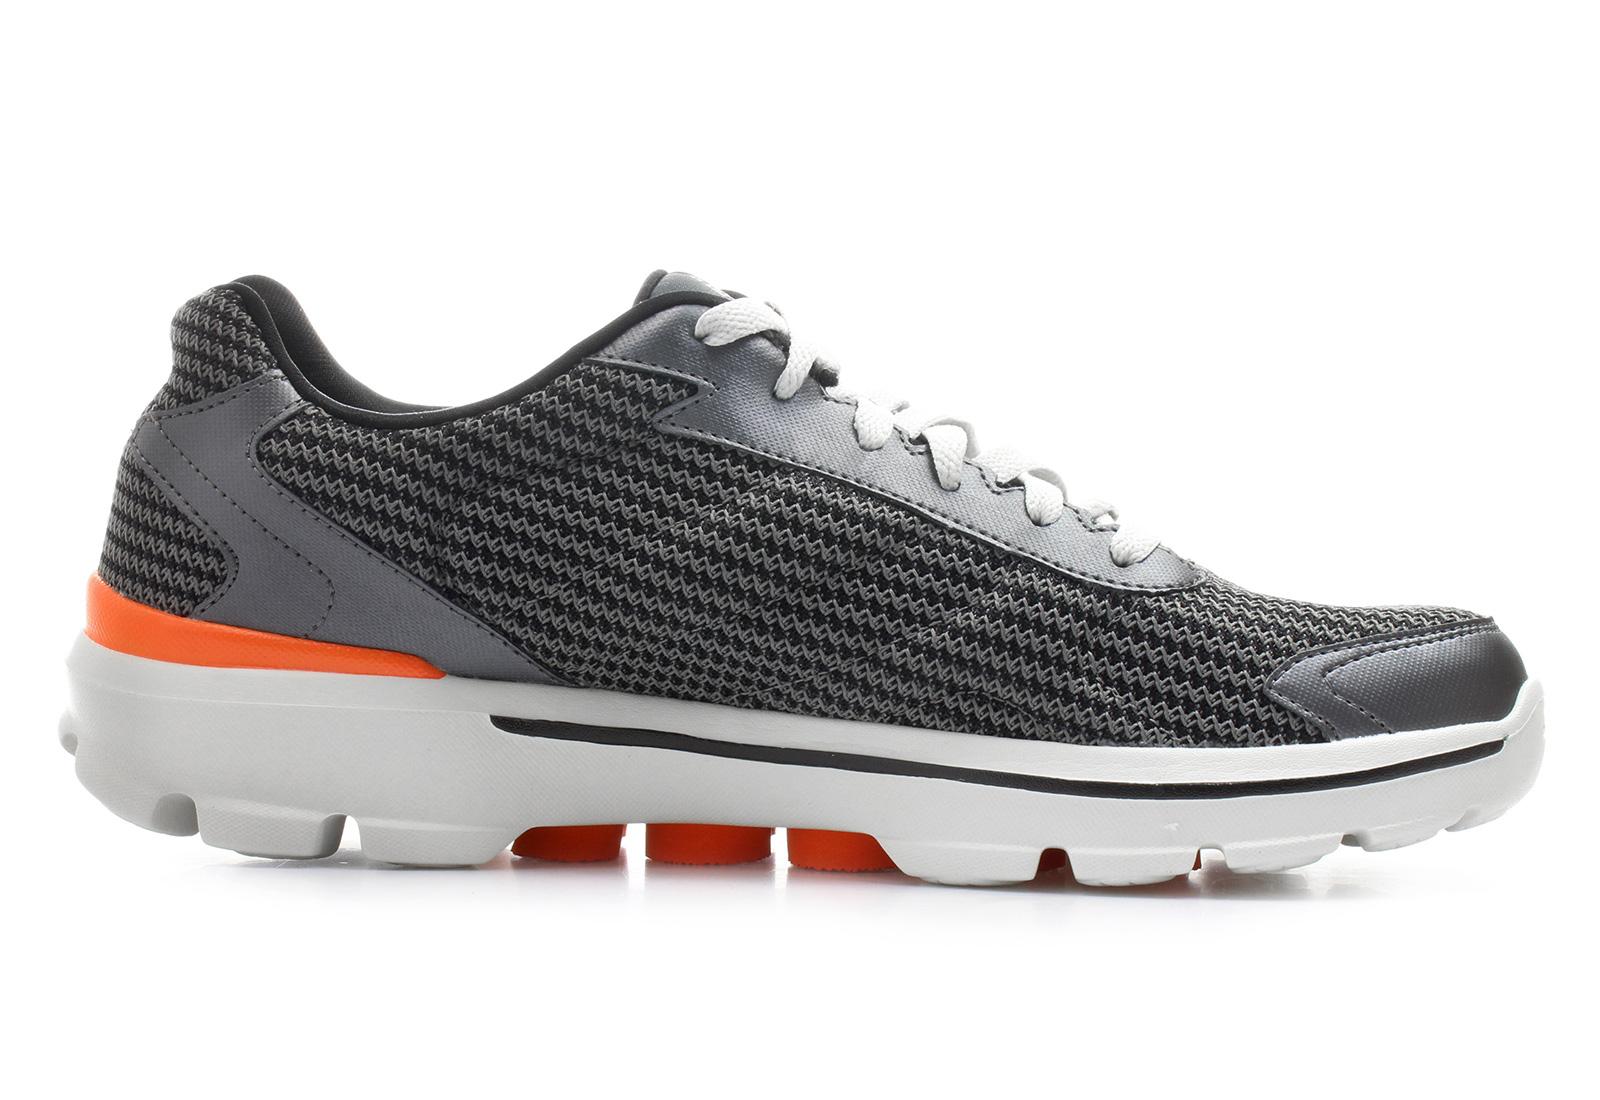 Skechers Shoes Fit Knit 53981 Ccor Online Shop For